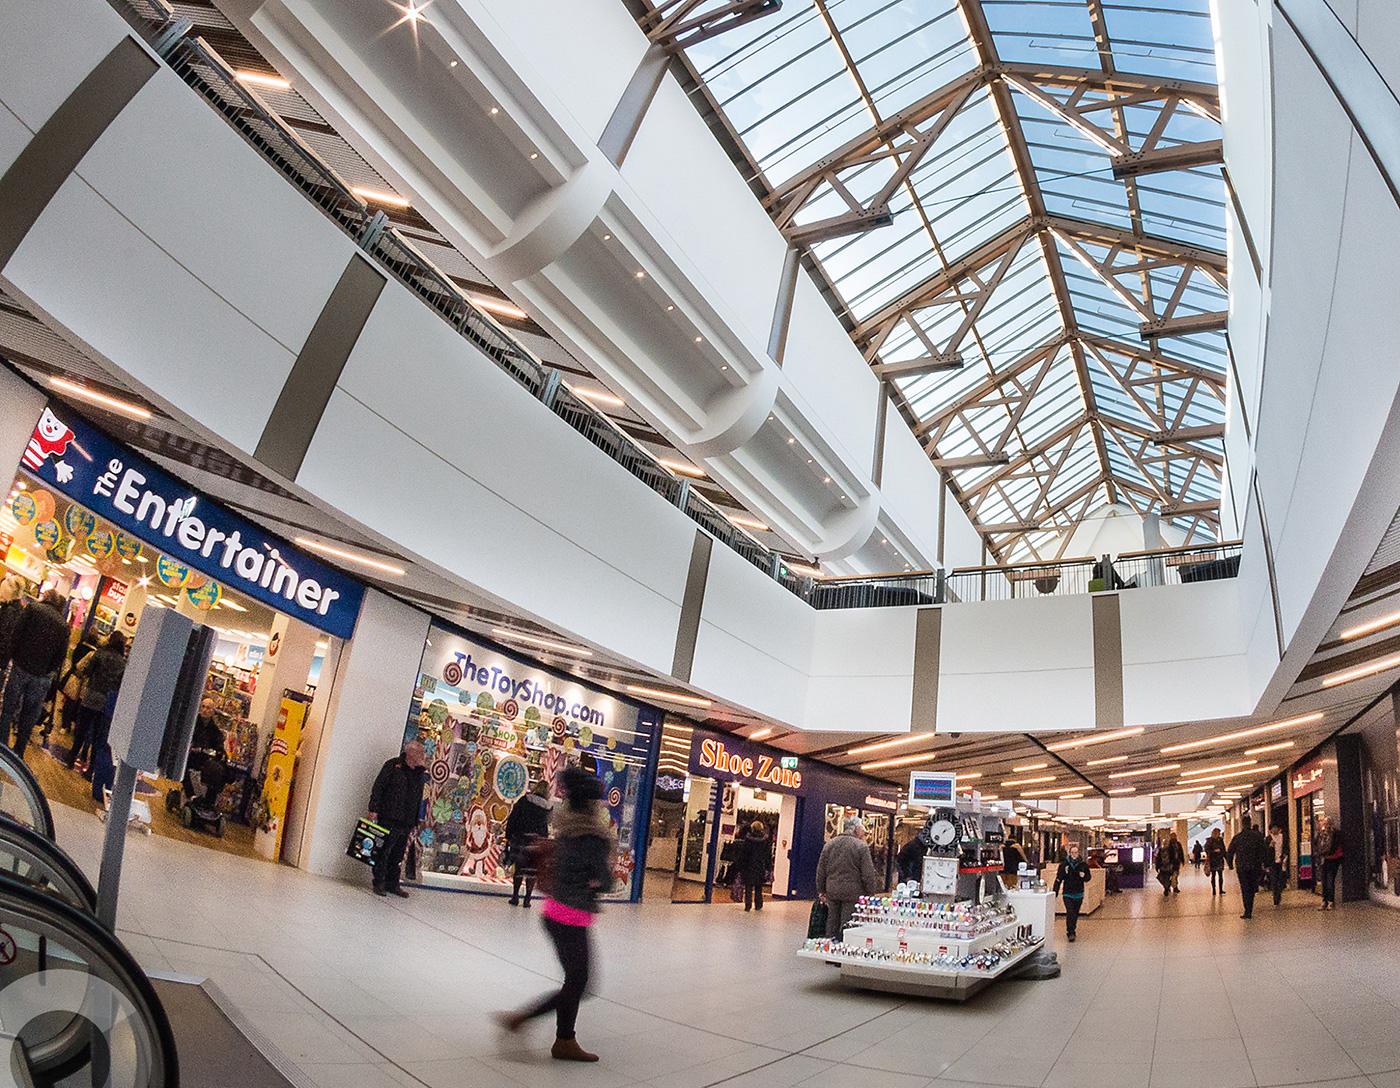 Maidstone Mall